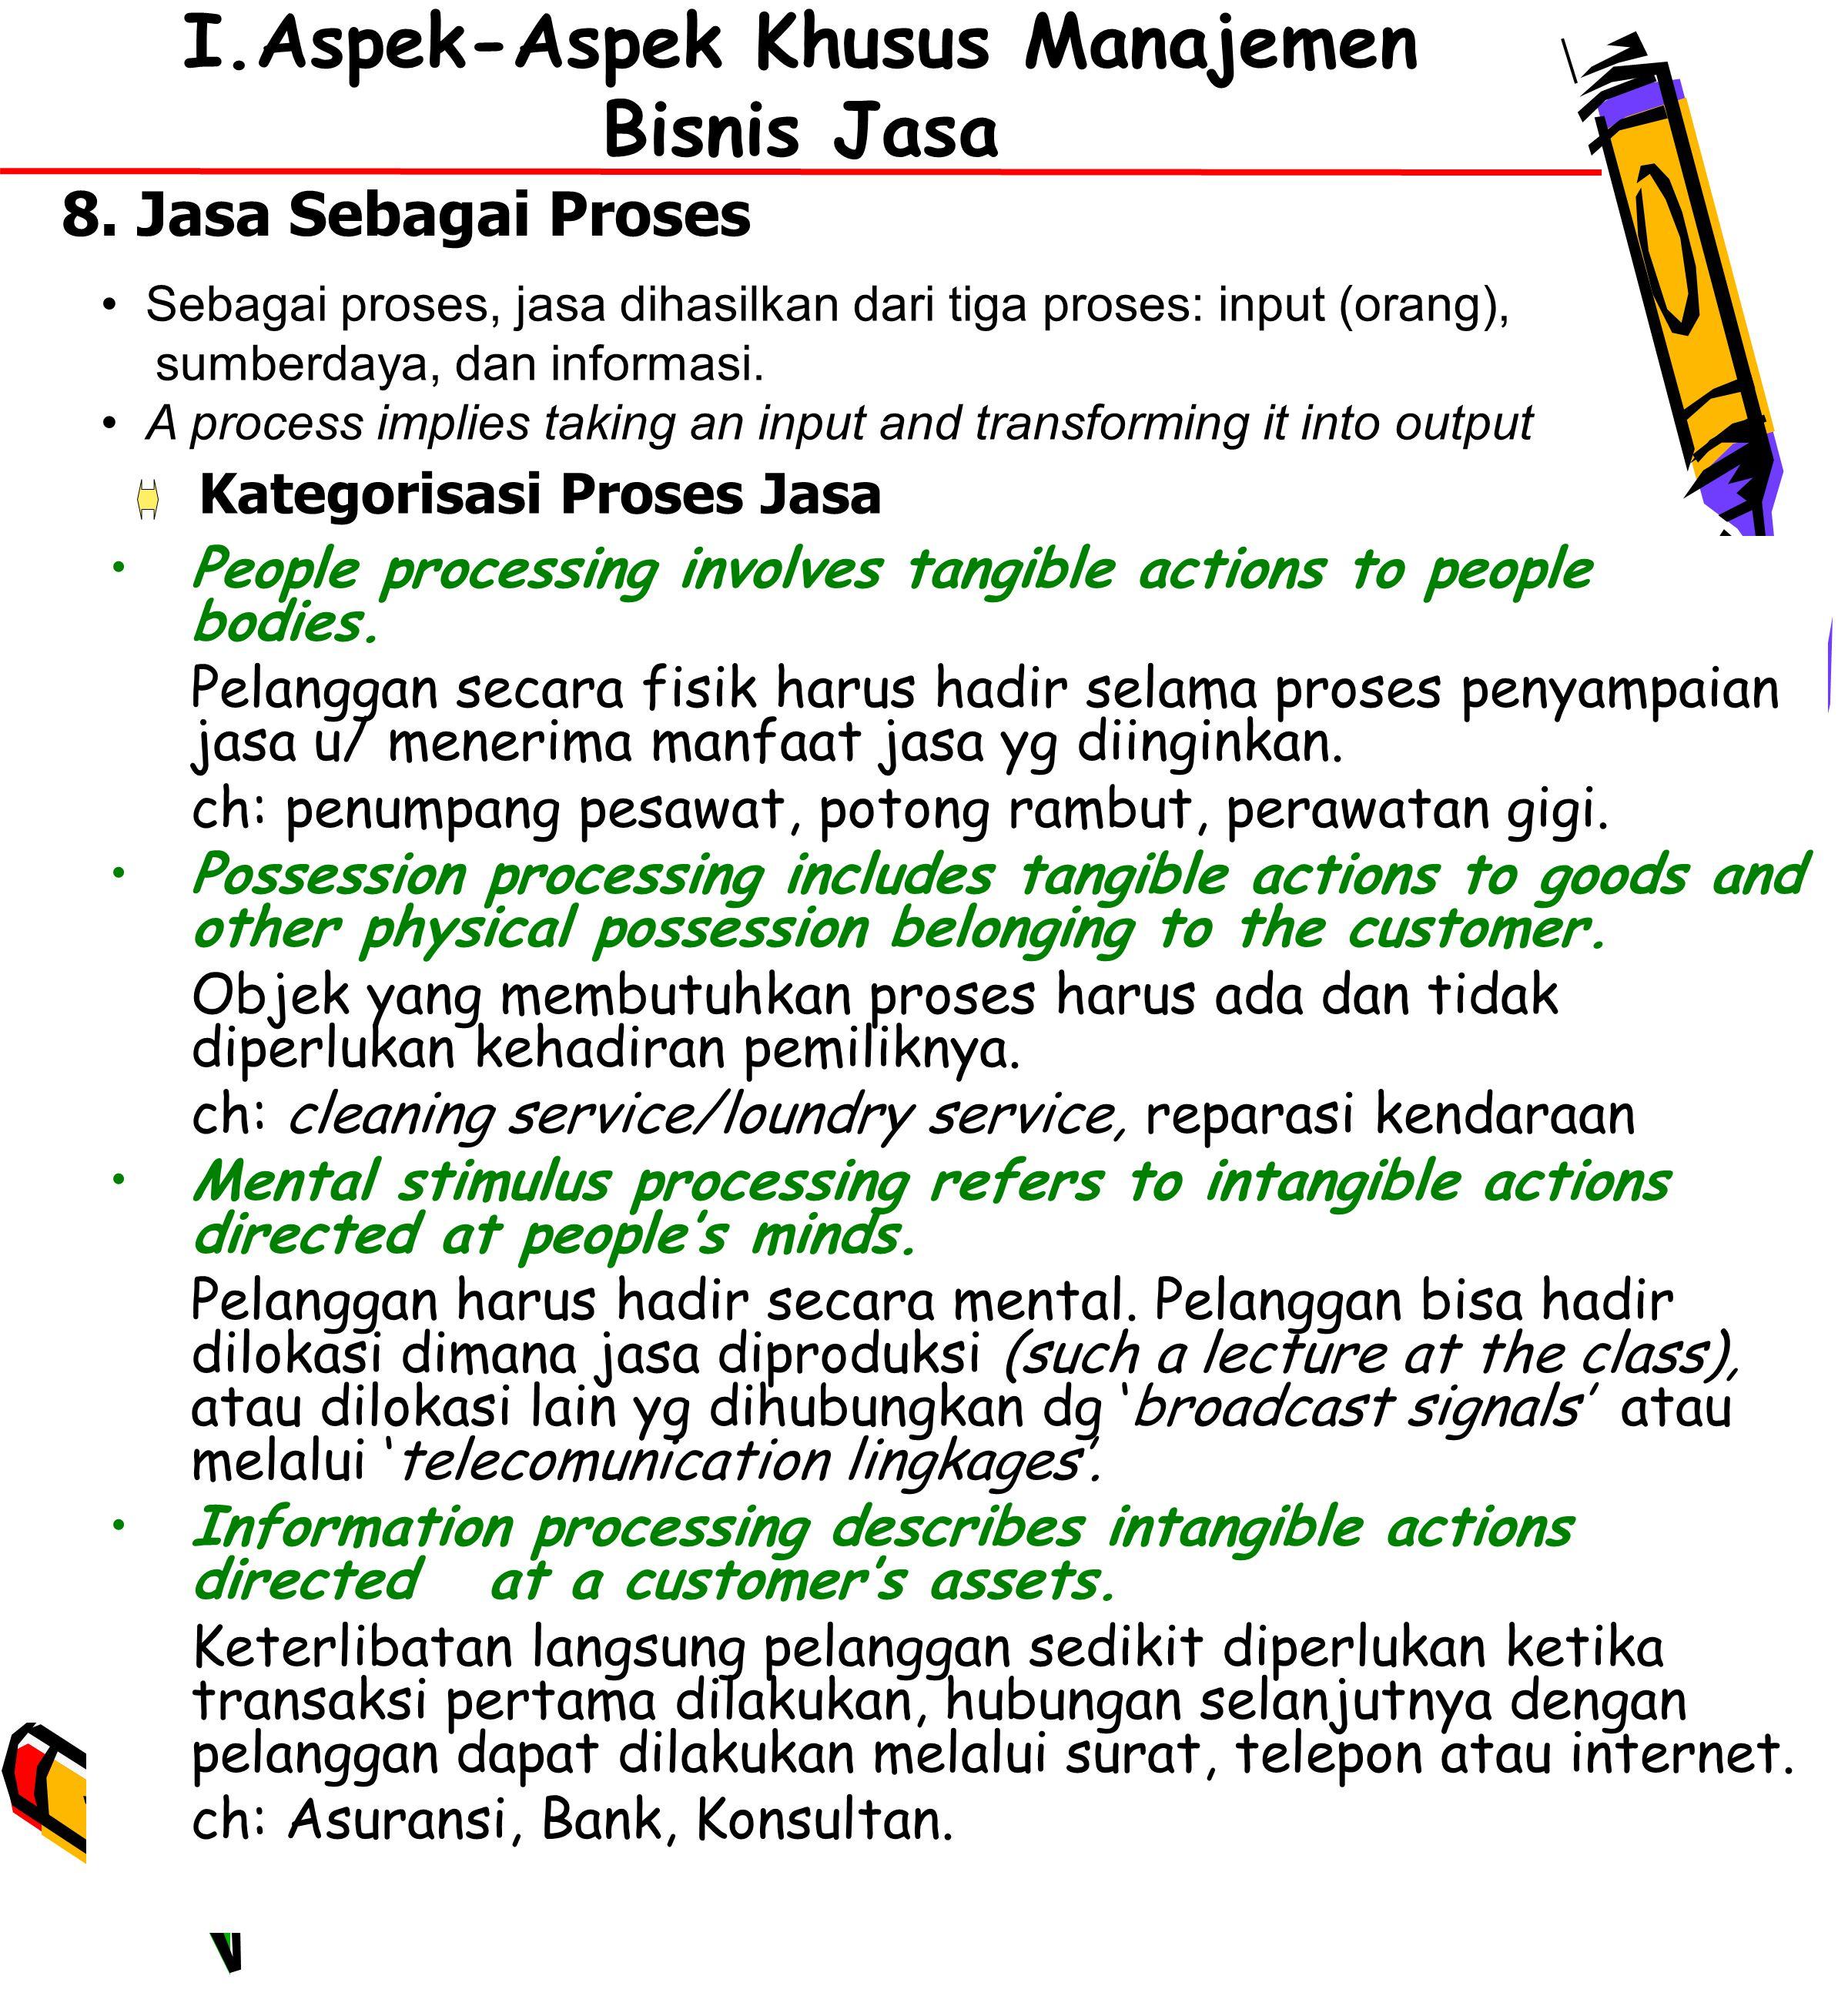 22 I.Aspek-Aspek Khusus Manajemen Bisnis Jasa People processing involves tangible actions to people bodies.